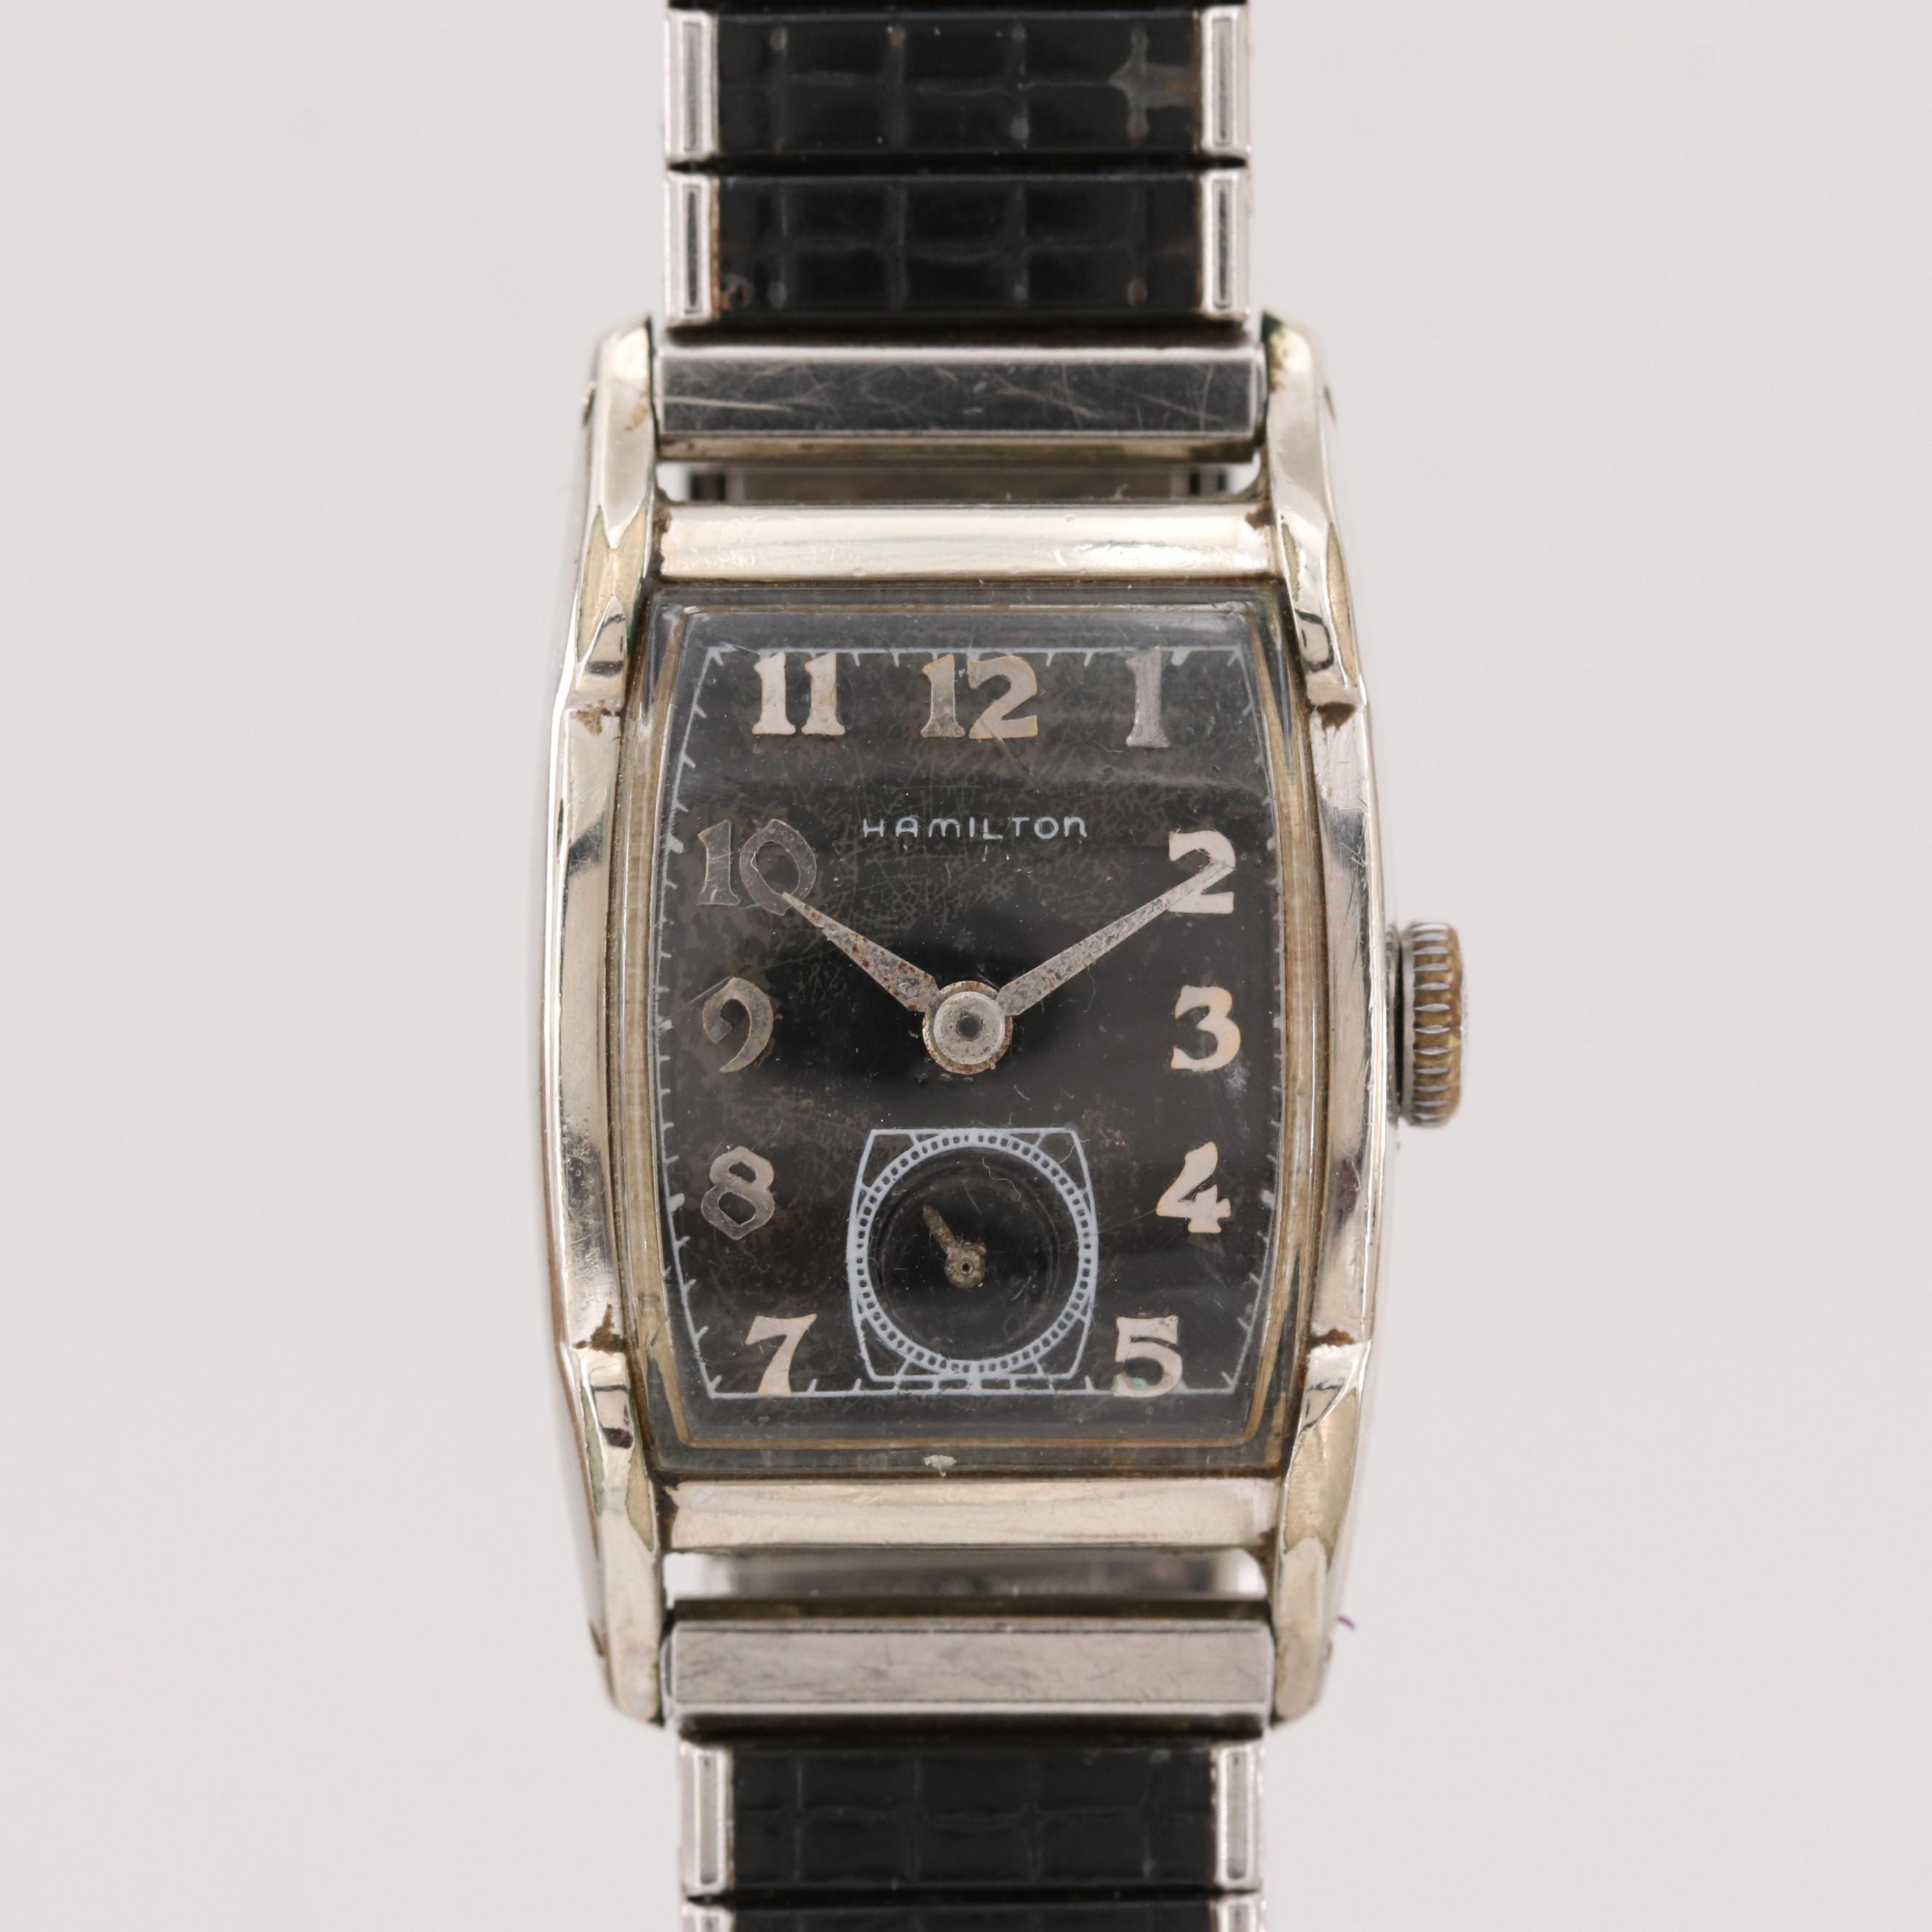 Hamilton 10K Gold Filled Wristwatch, 1952